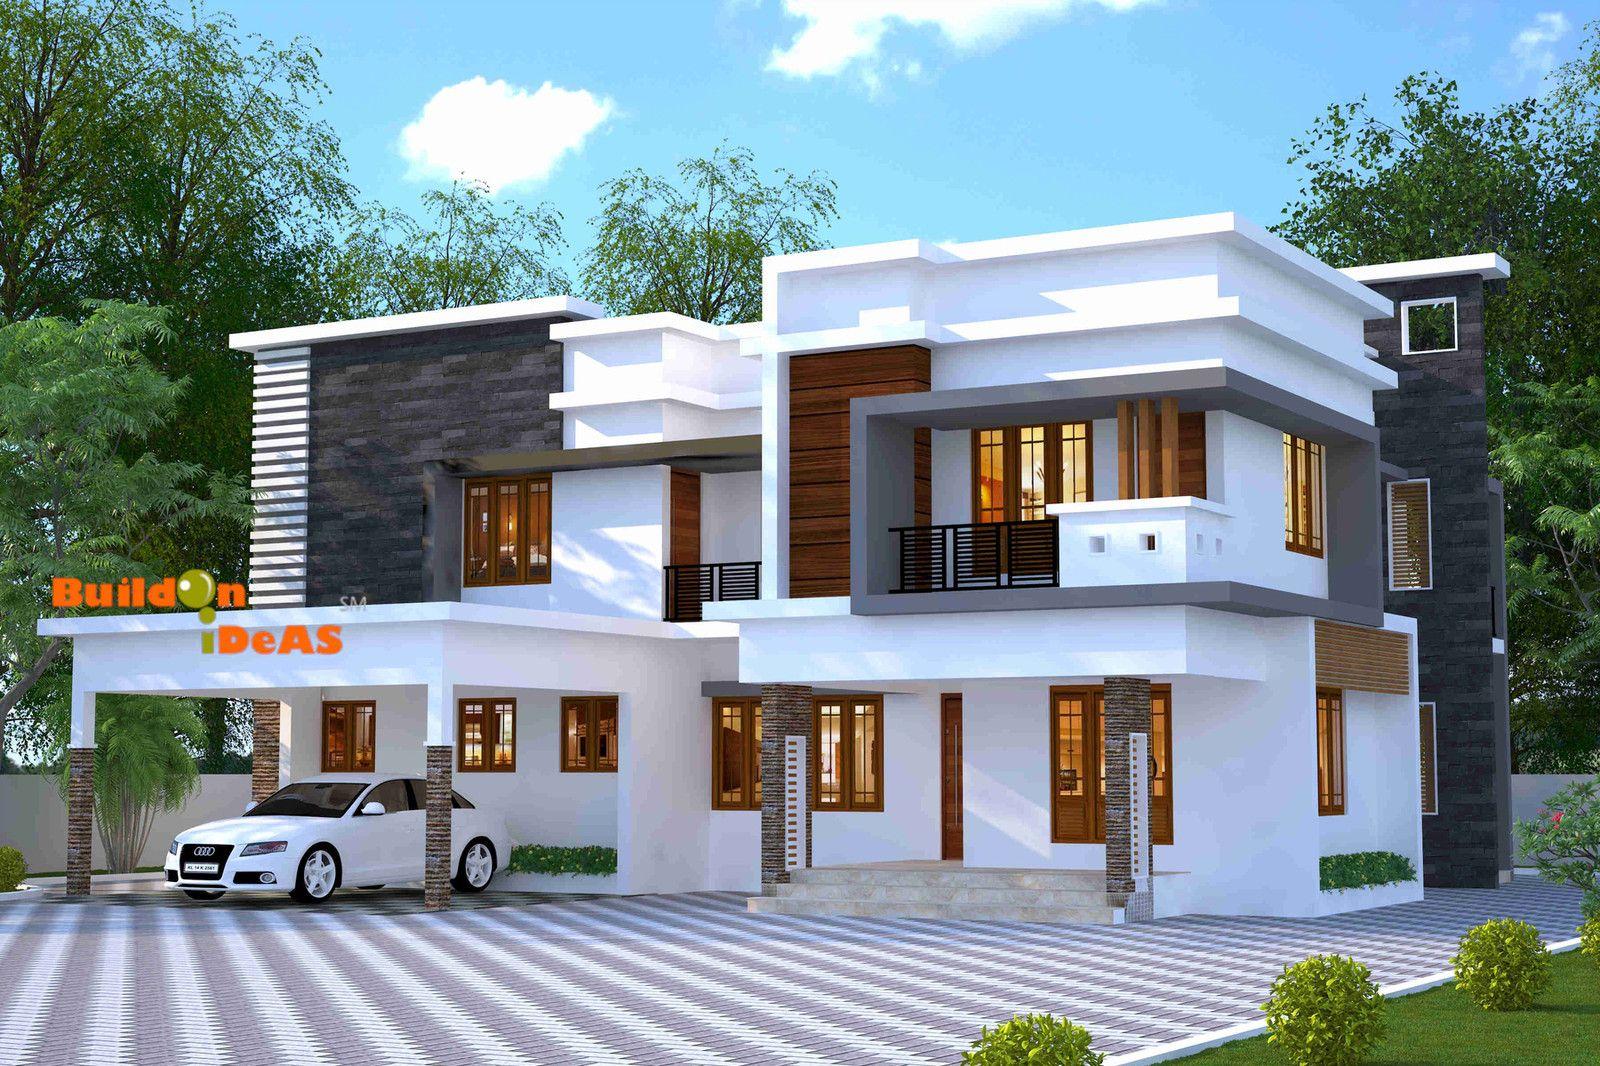 Best home modern design ideas also most popular photo wall in house rh pinterest